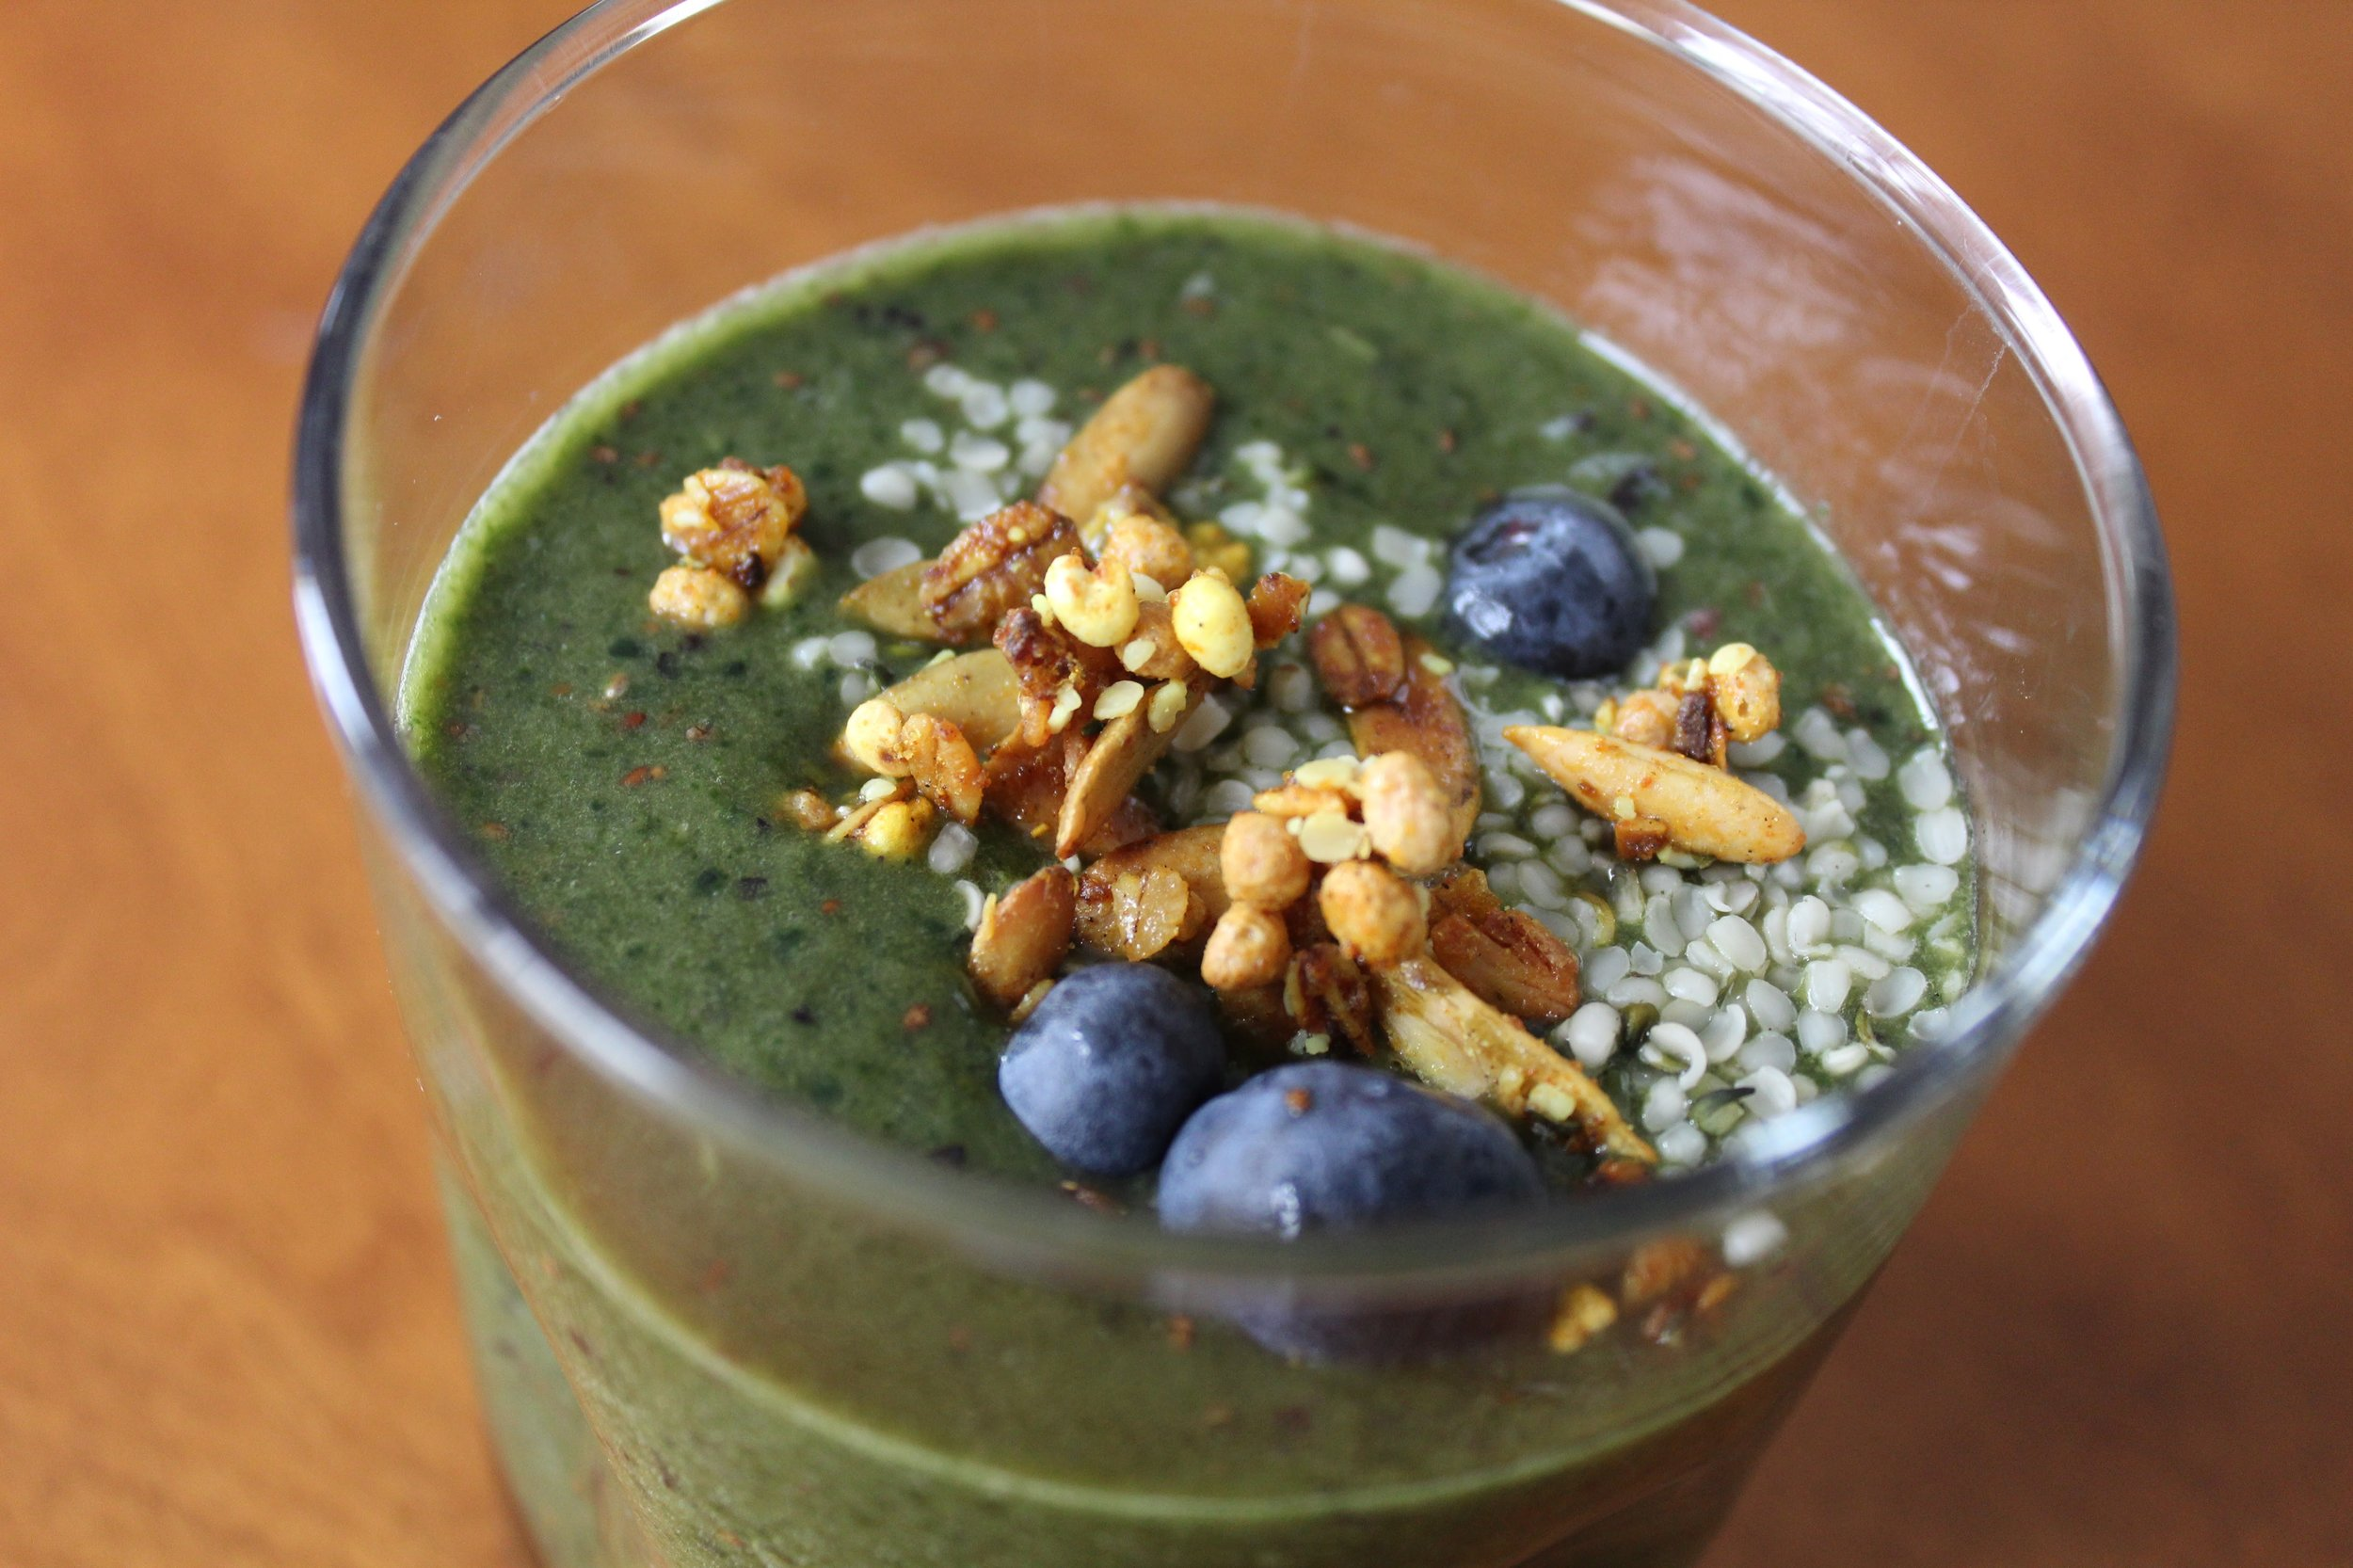 Morning Green Smoothie Recipe from www.natashawellness.com